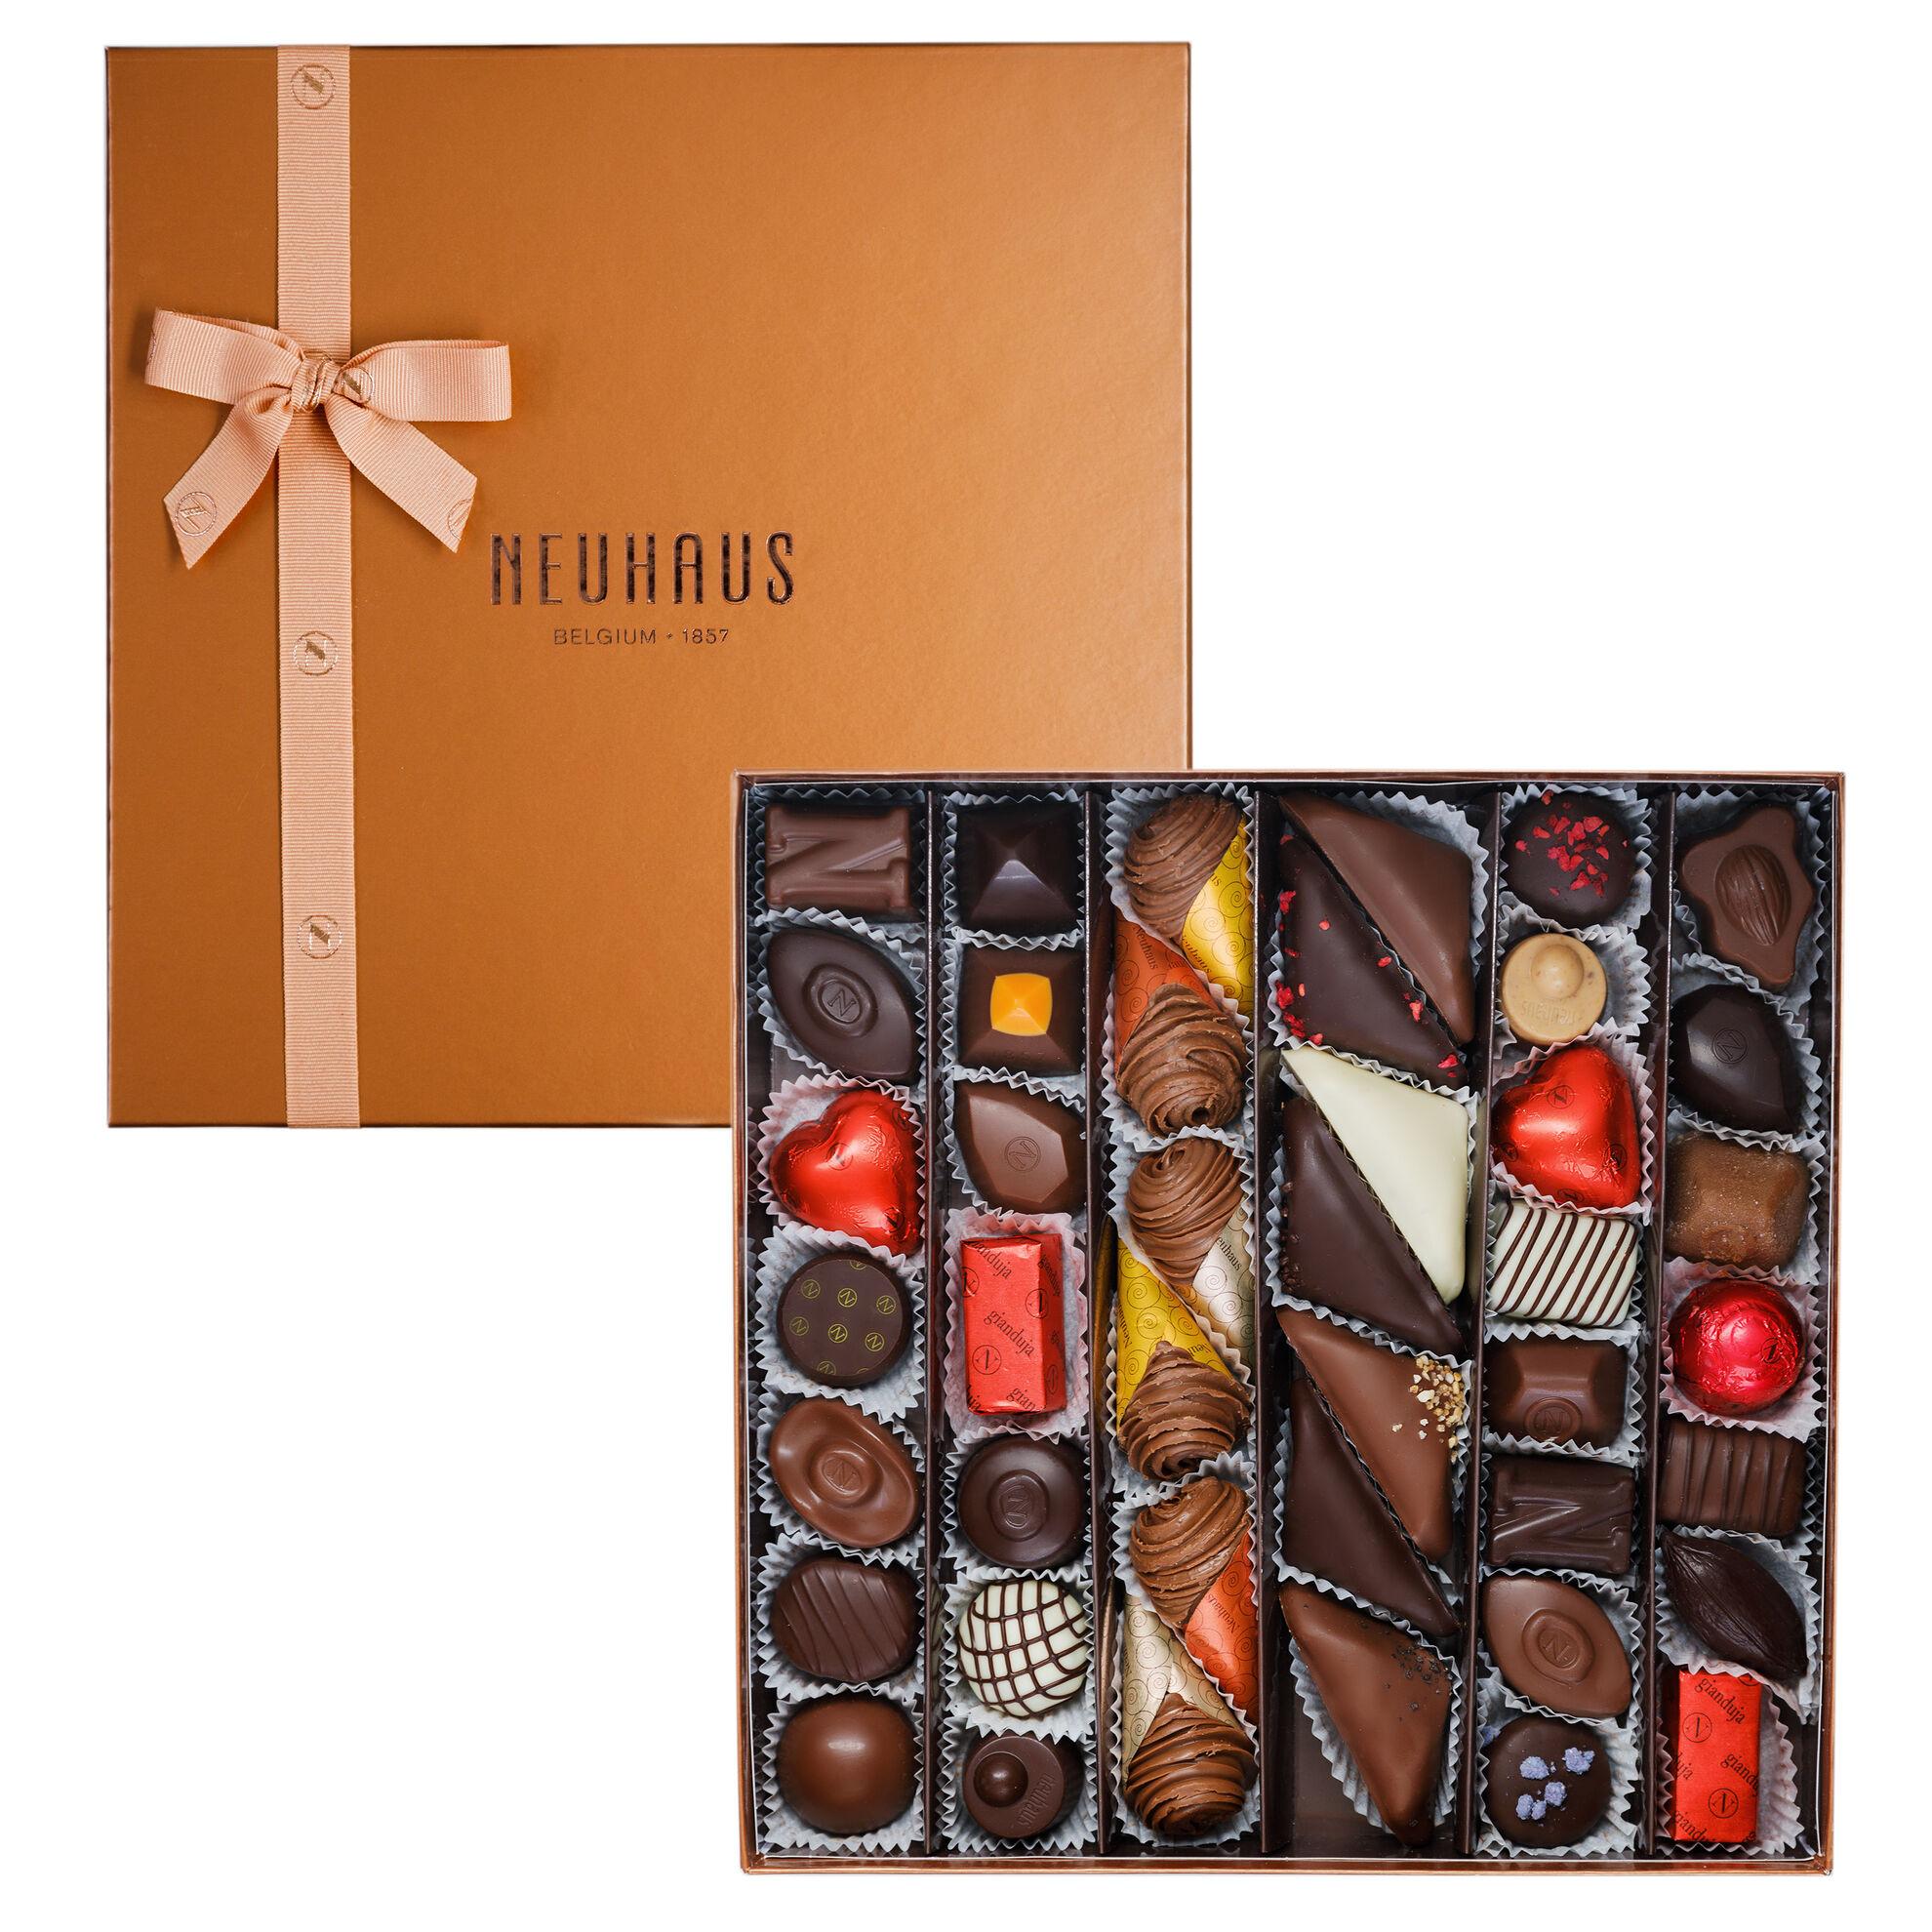 Luxury Belgian Chocolate Gift Box by Neuhaus 42 pcs image number 01